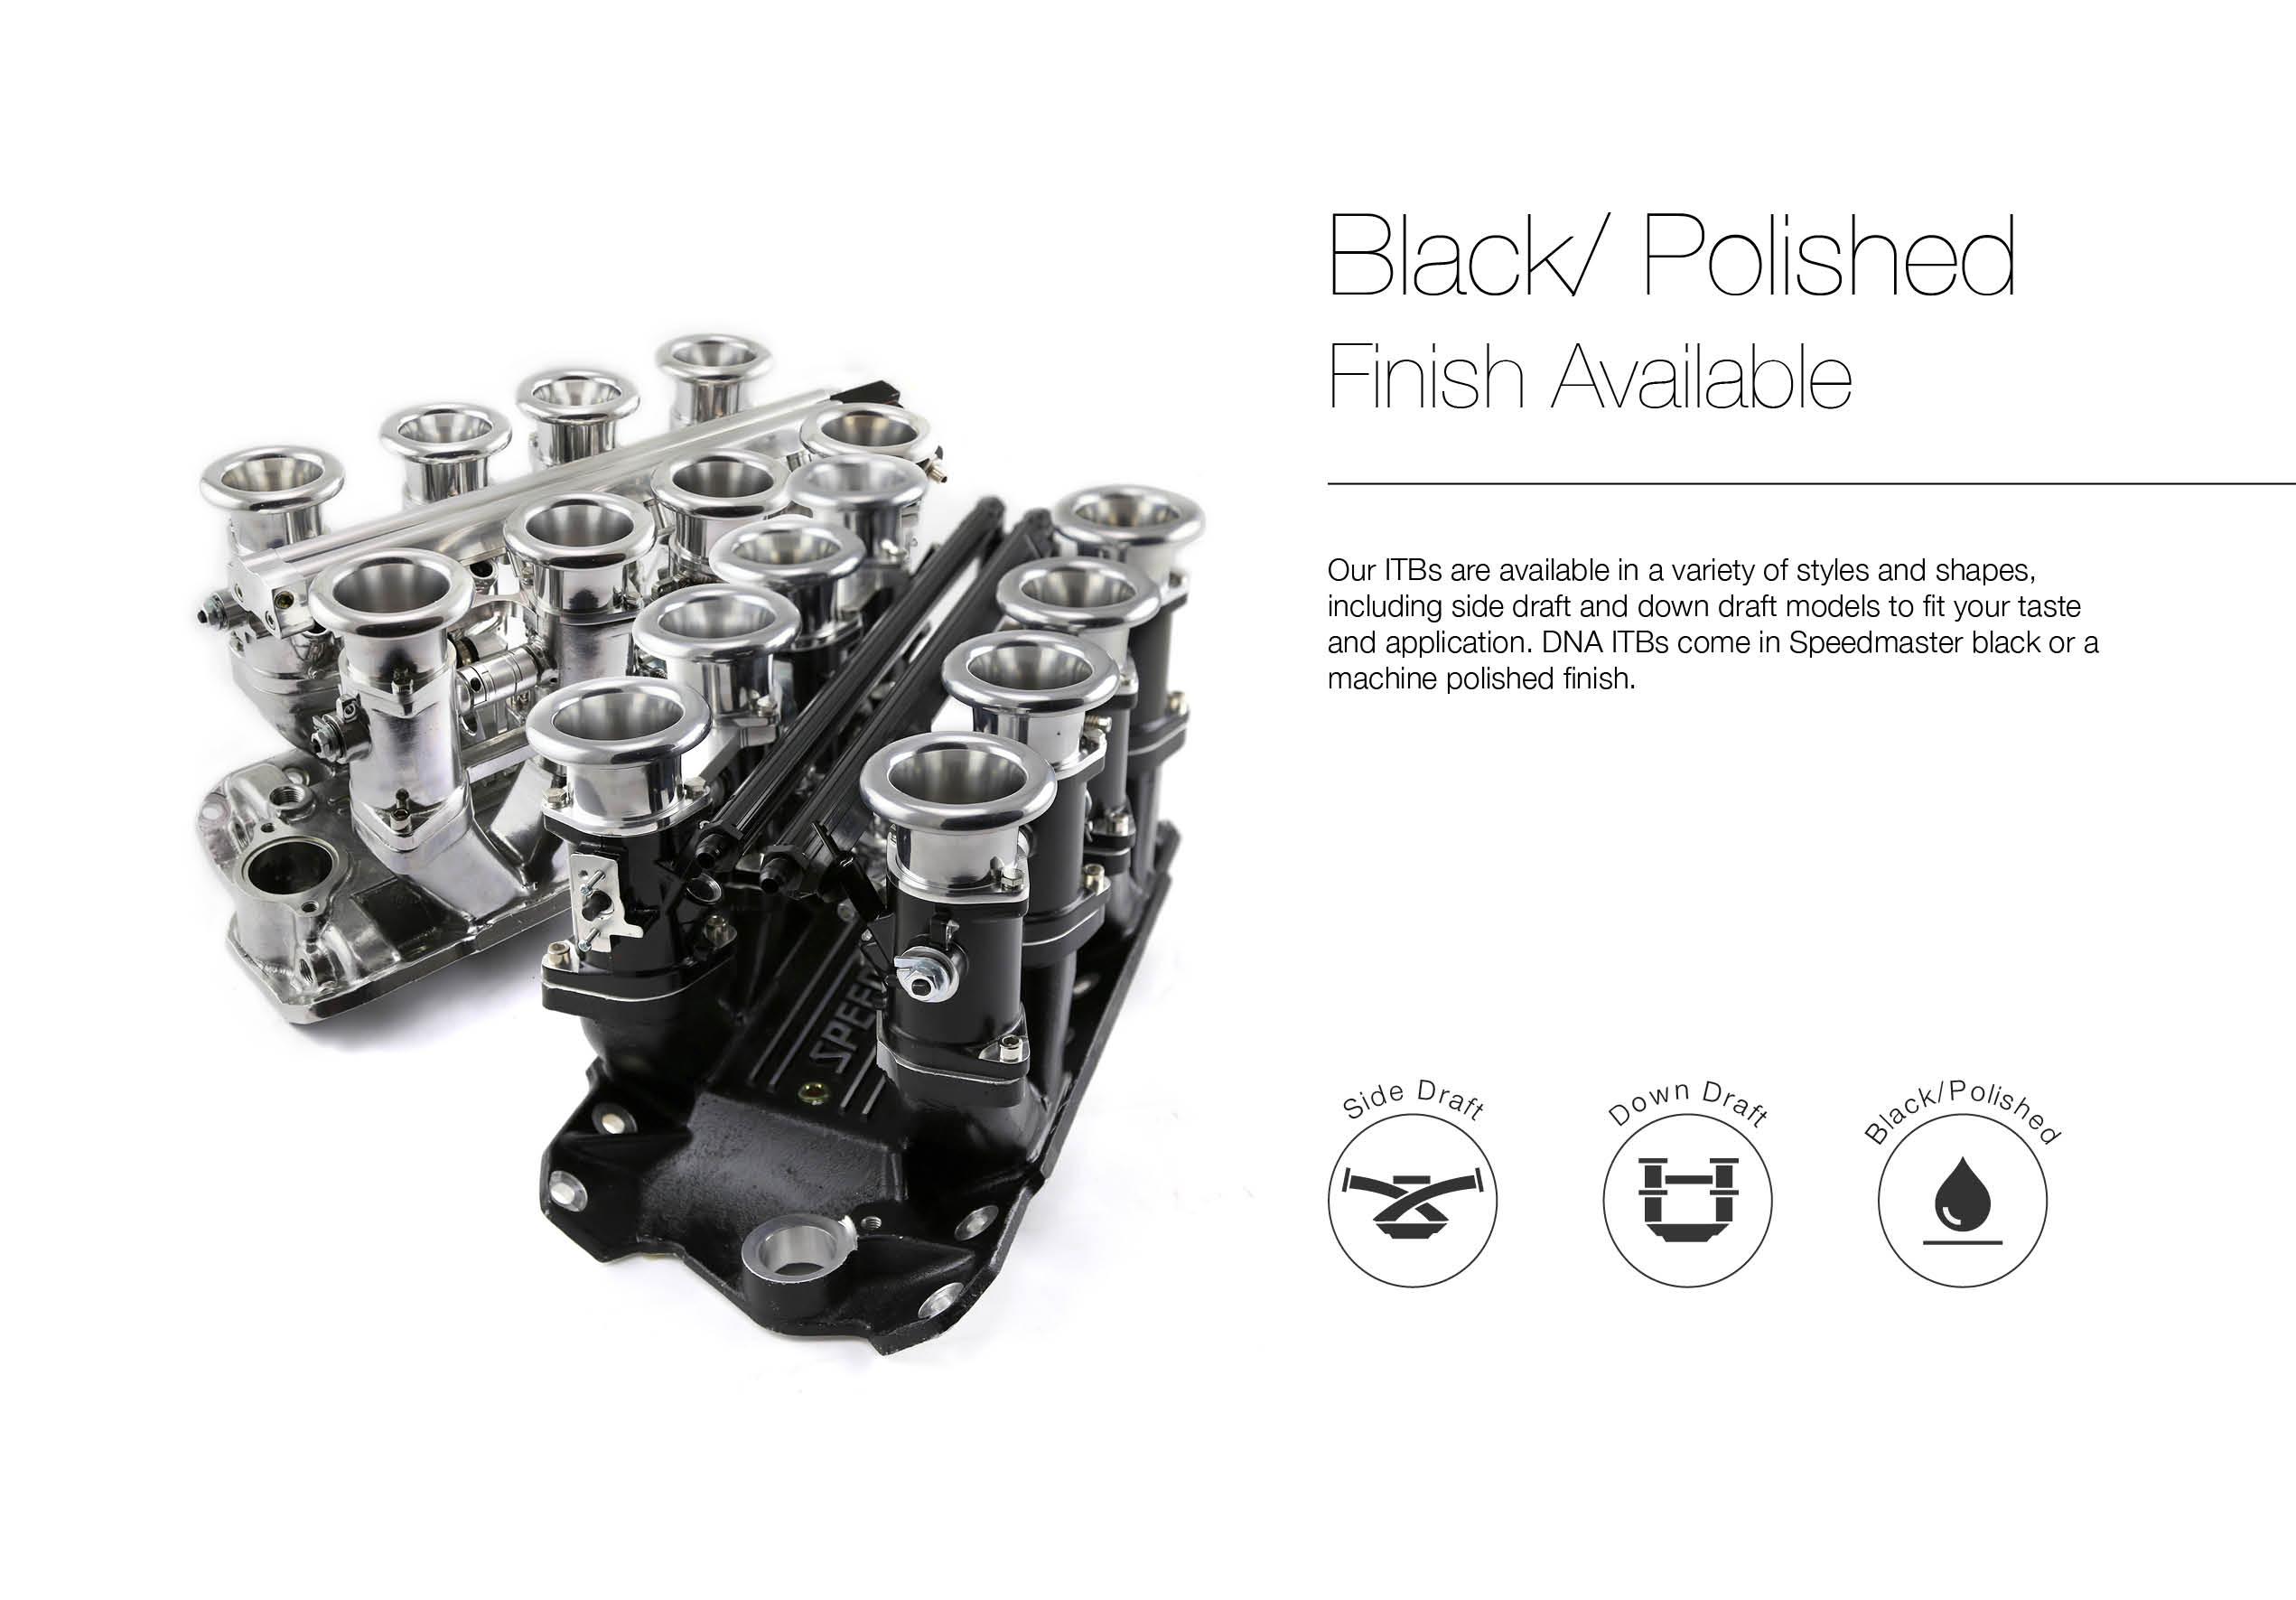 Ford Fe 390 427 428 Downdraft Efi Stack Intake Manifold